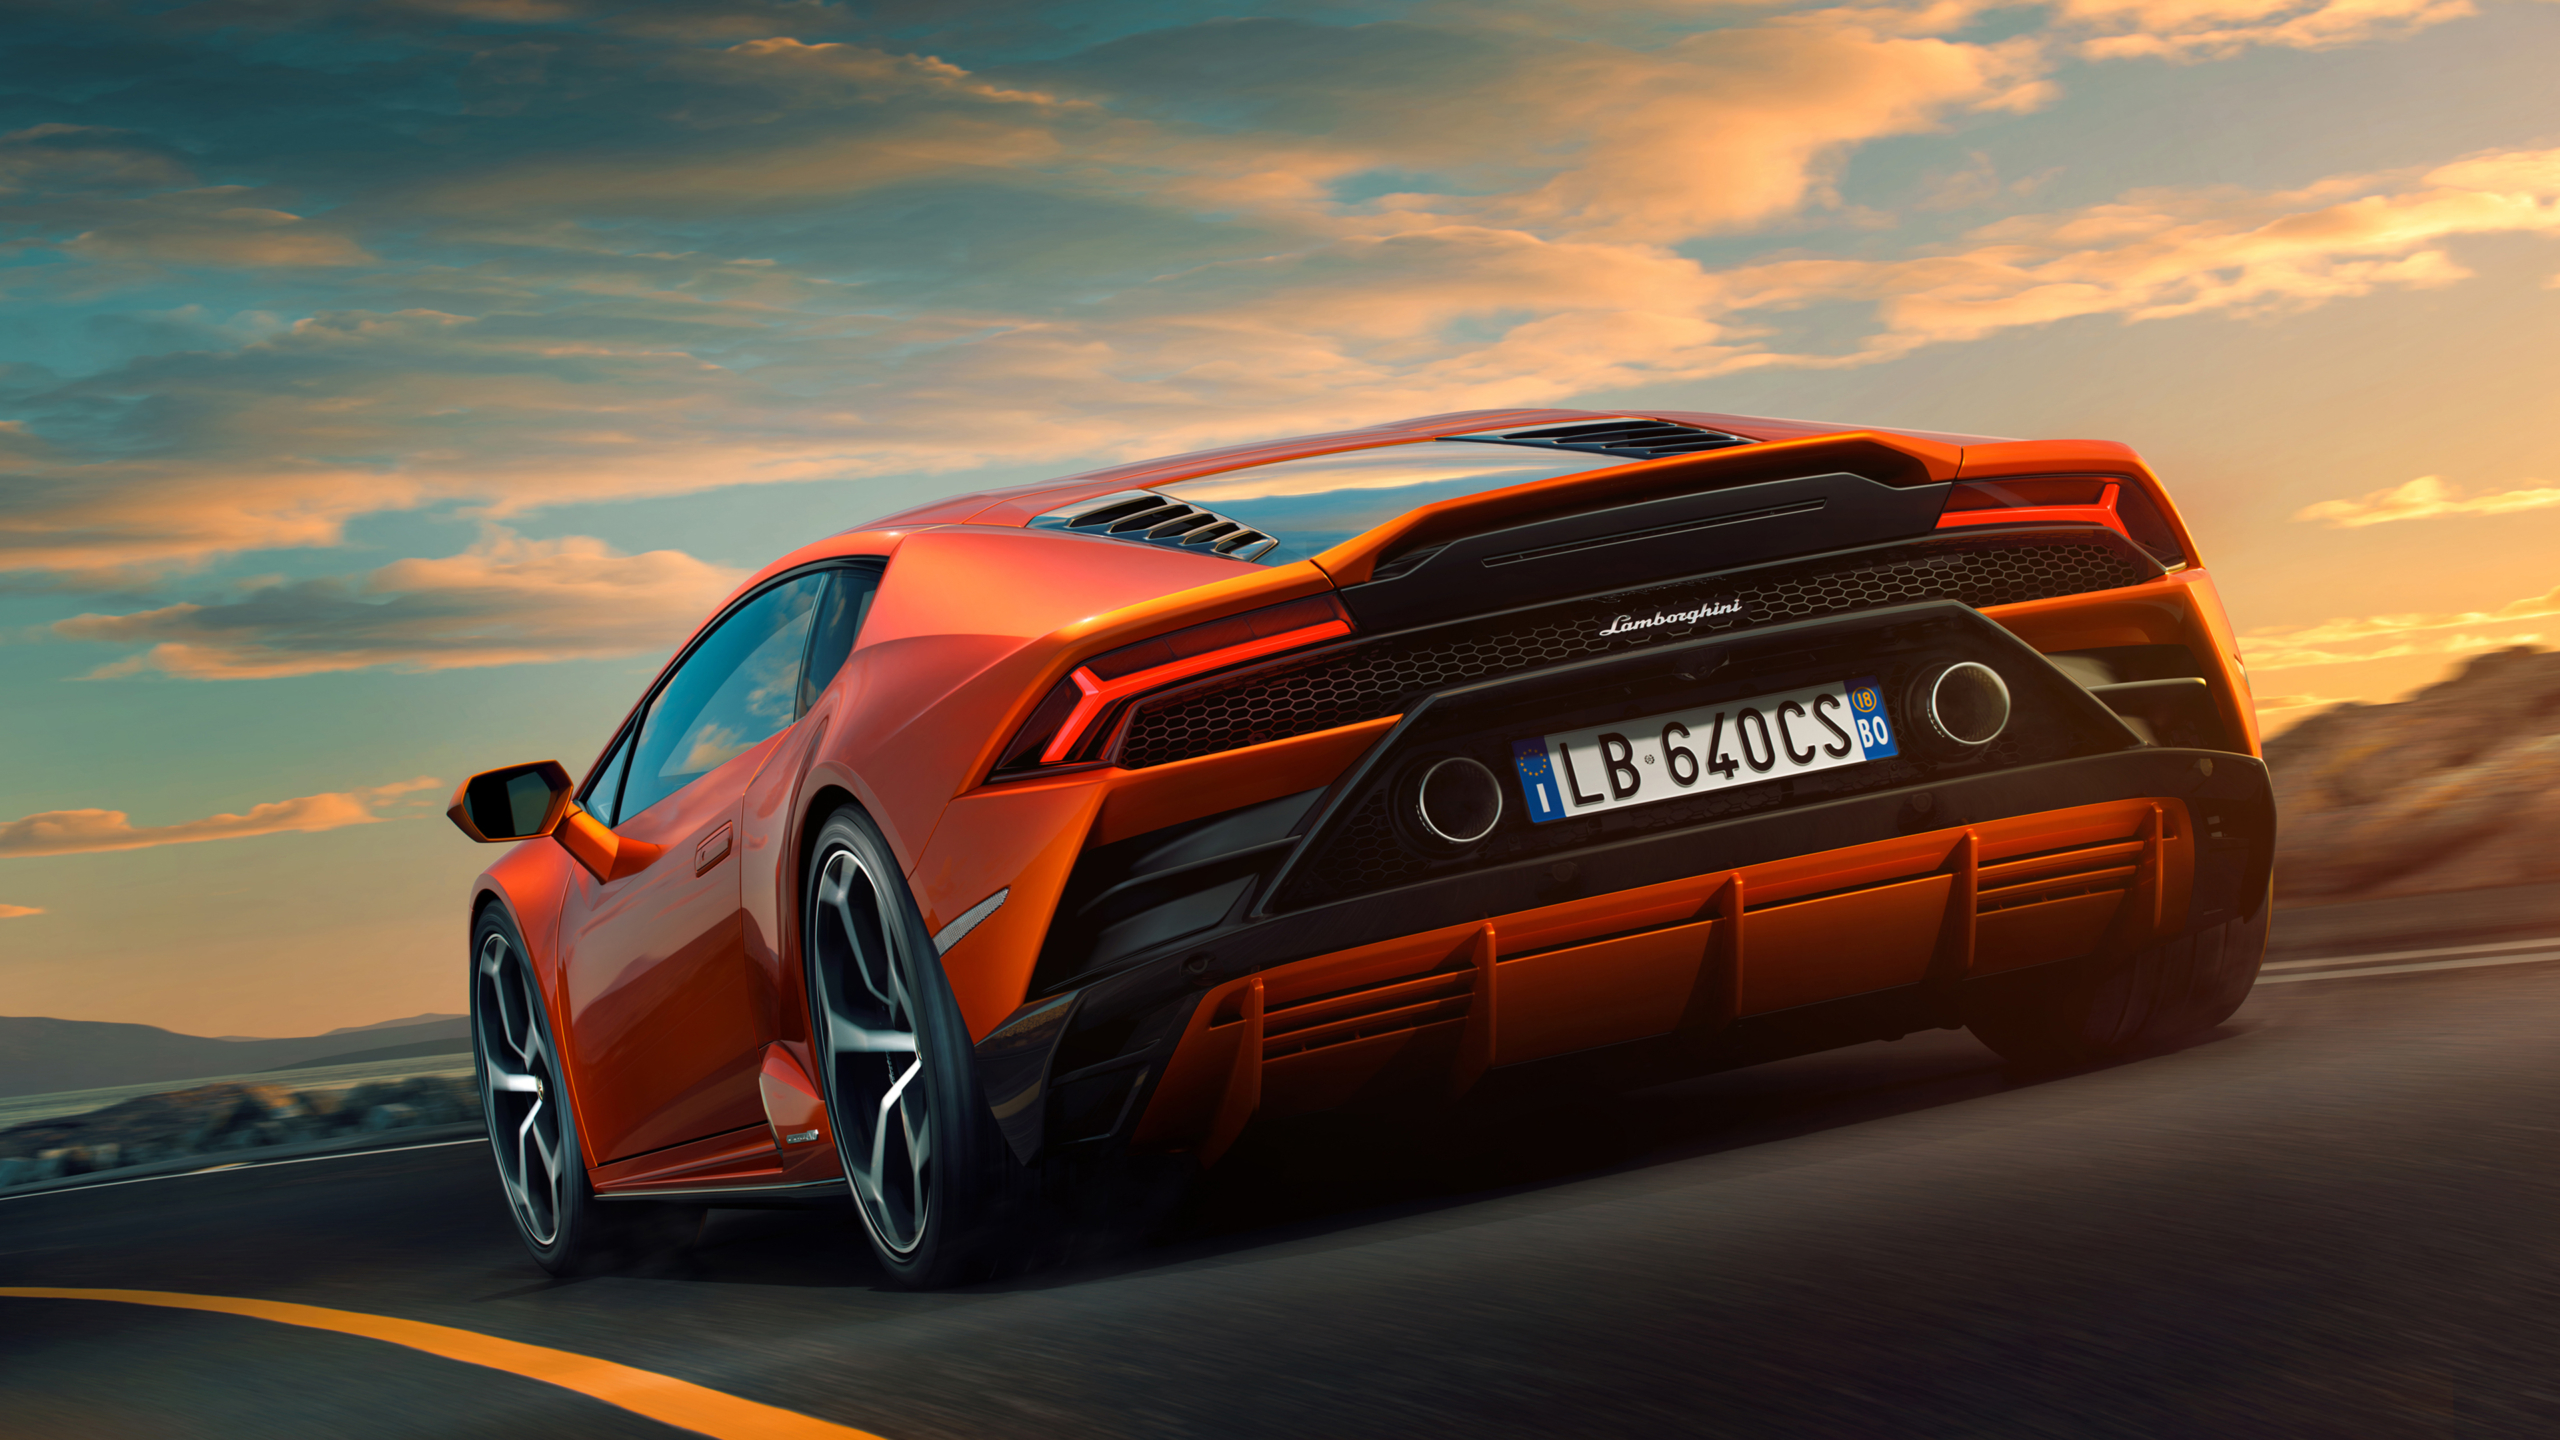 Inspiring Wallpaper design on Lamborghini Huracan